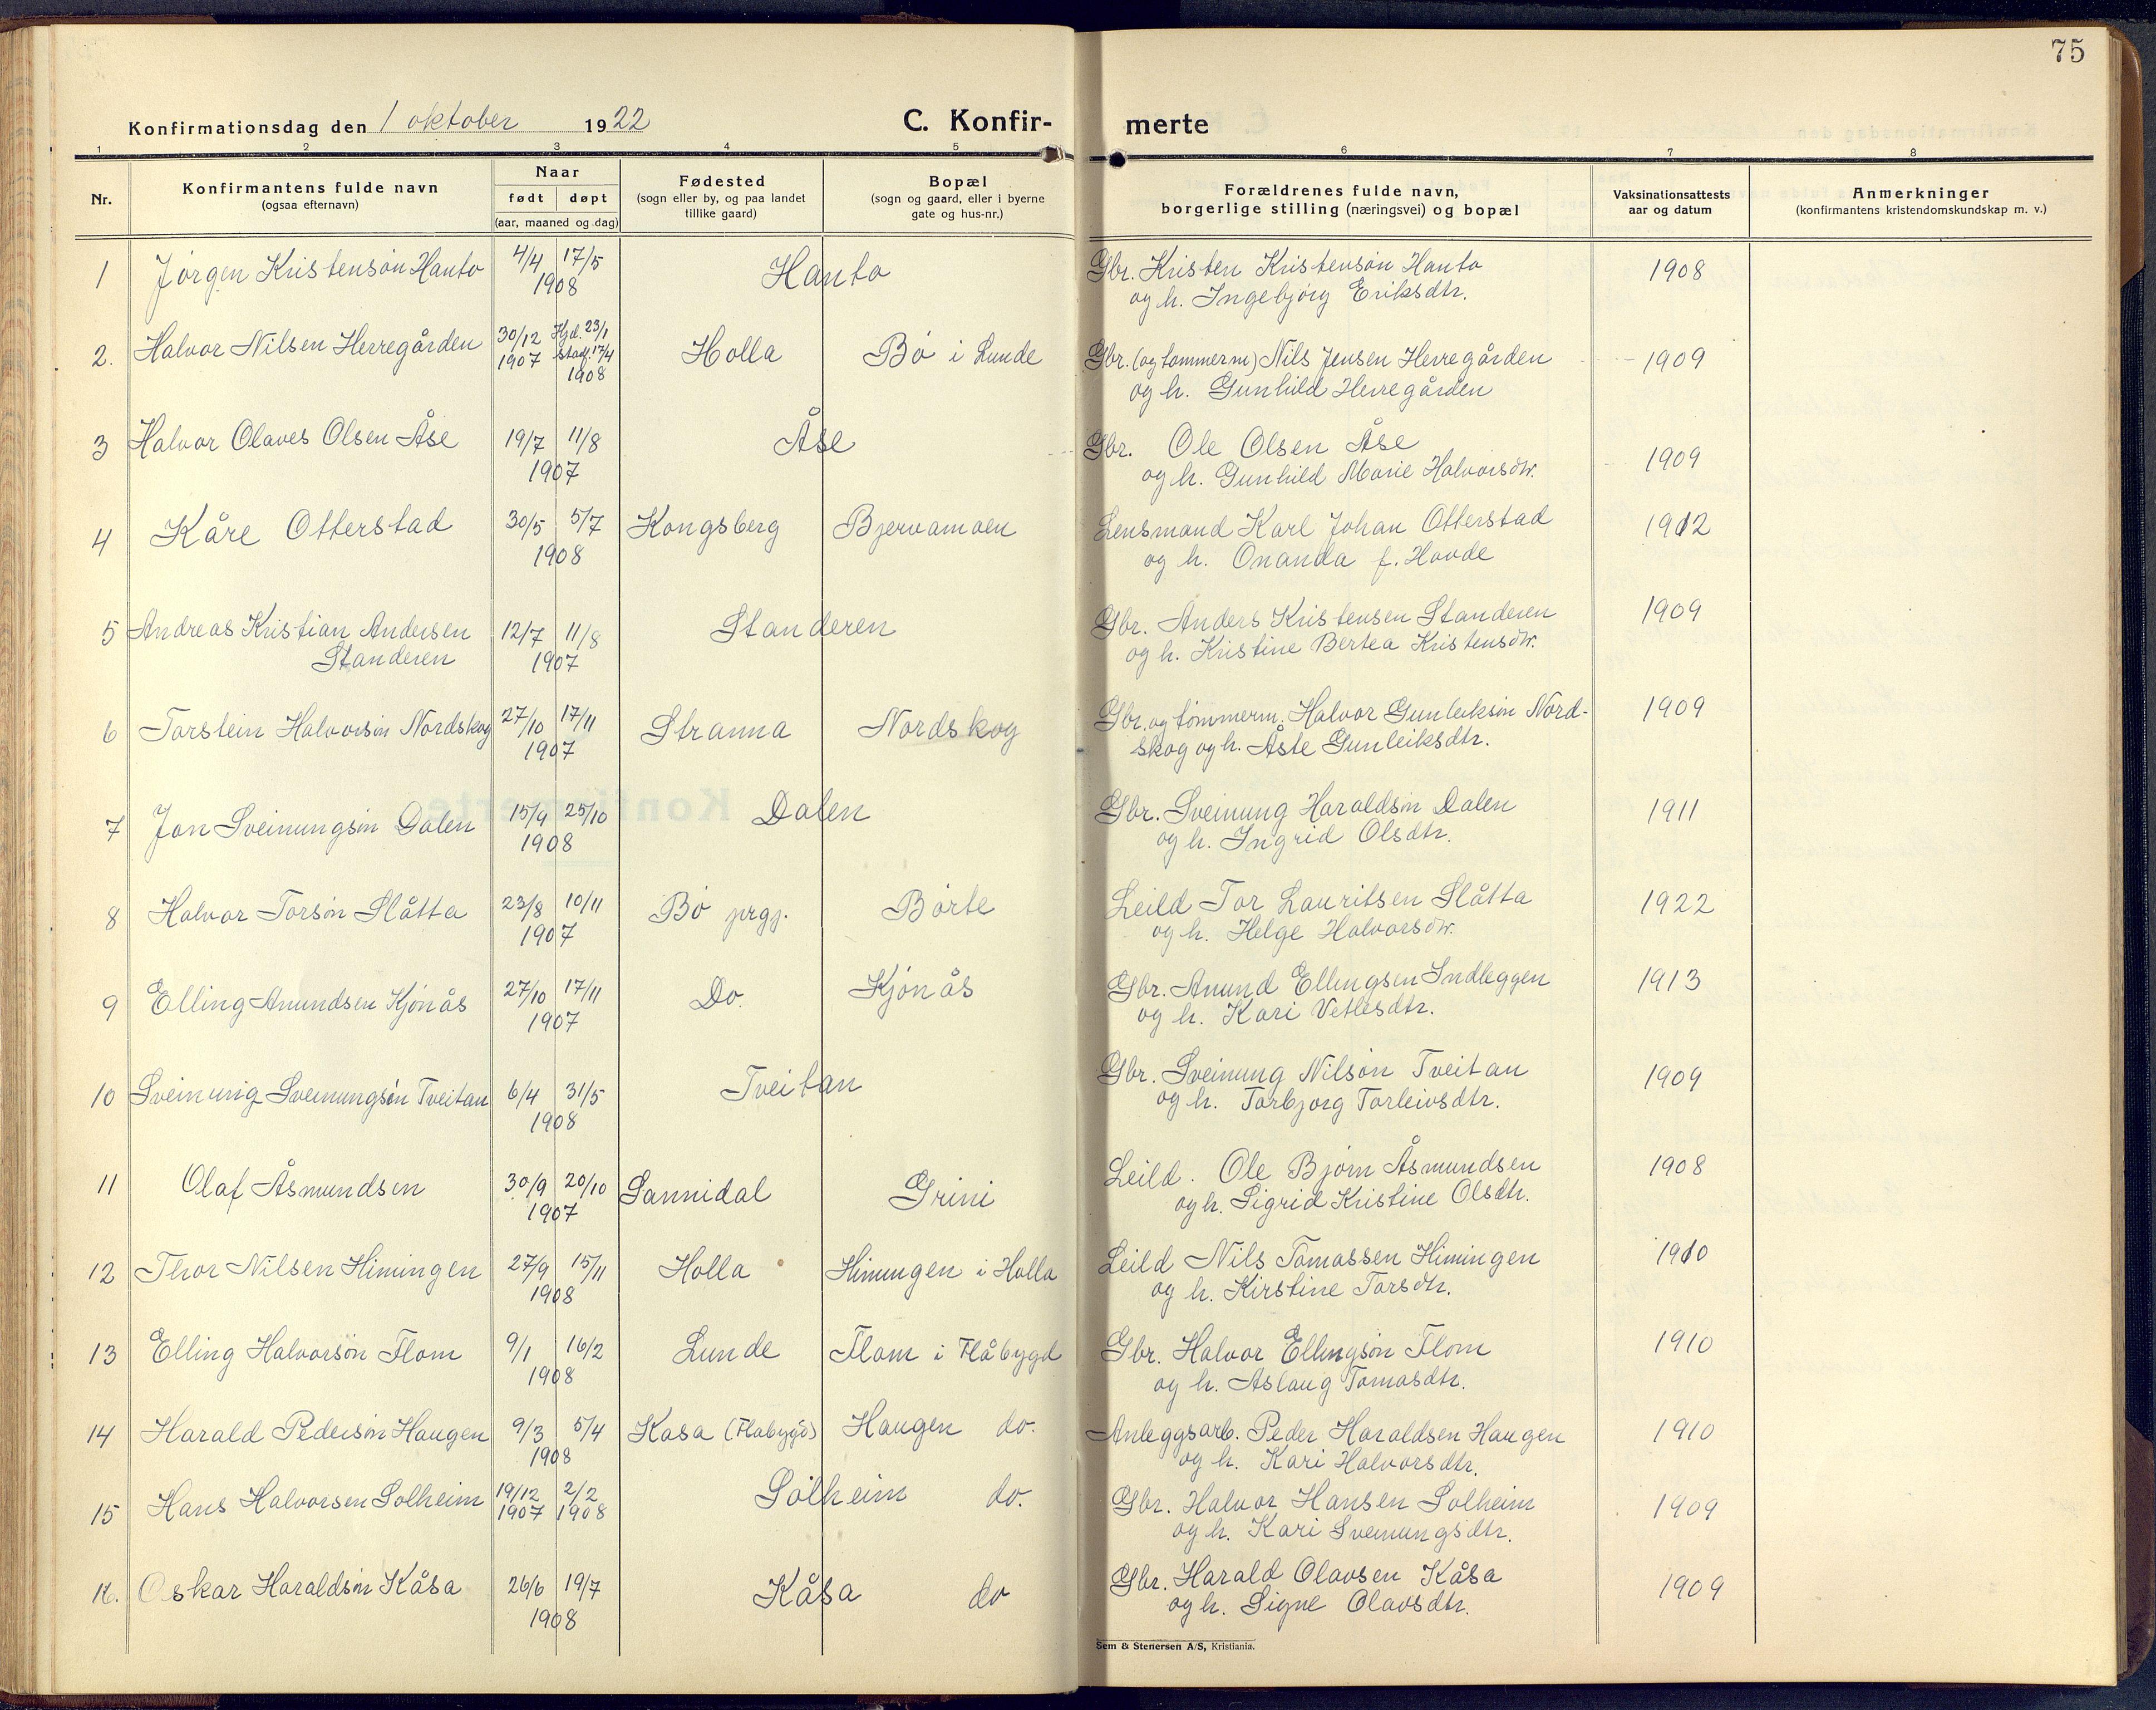 SAKO, Lunde kirkebøker, F/Fa/L0006: Ministerialbok nr. I 6, 1922-1940, s. 75